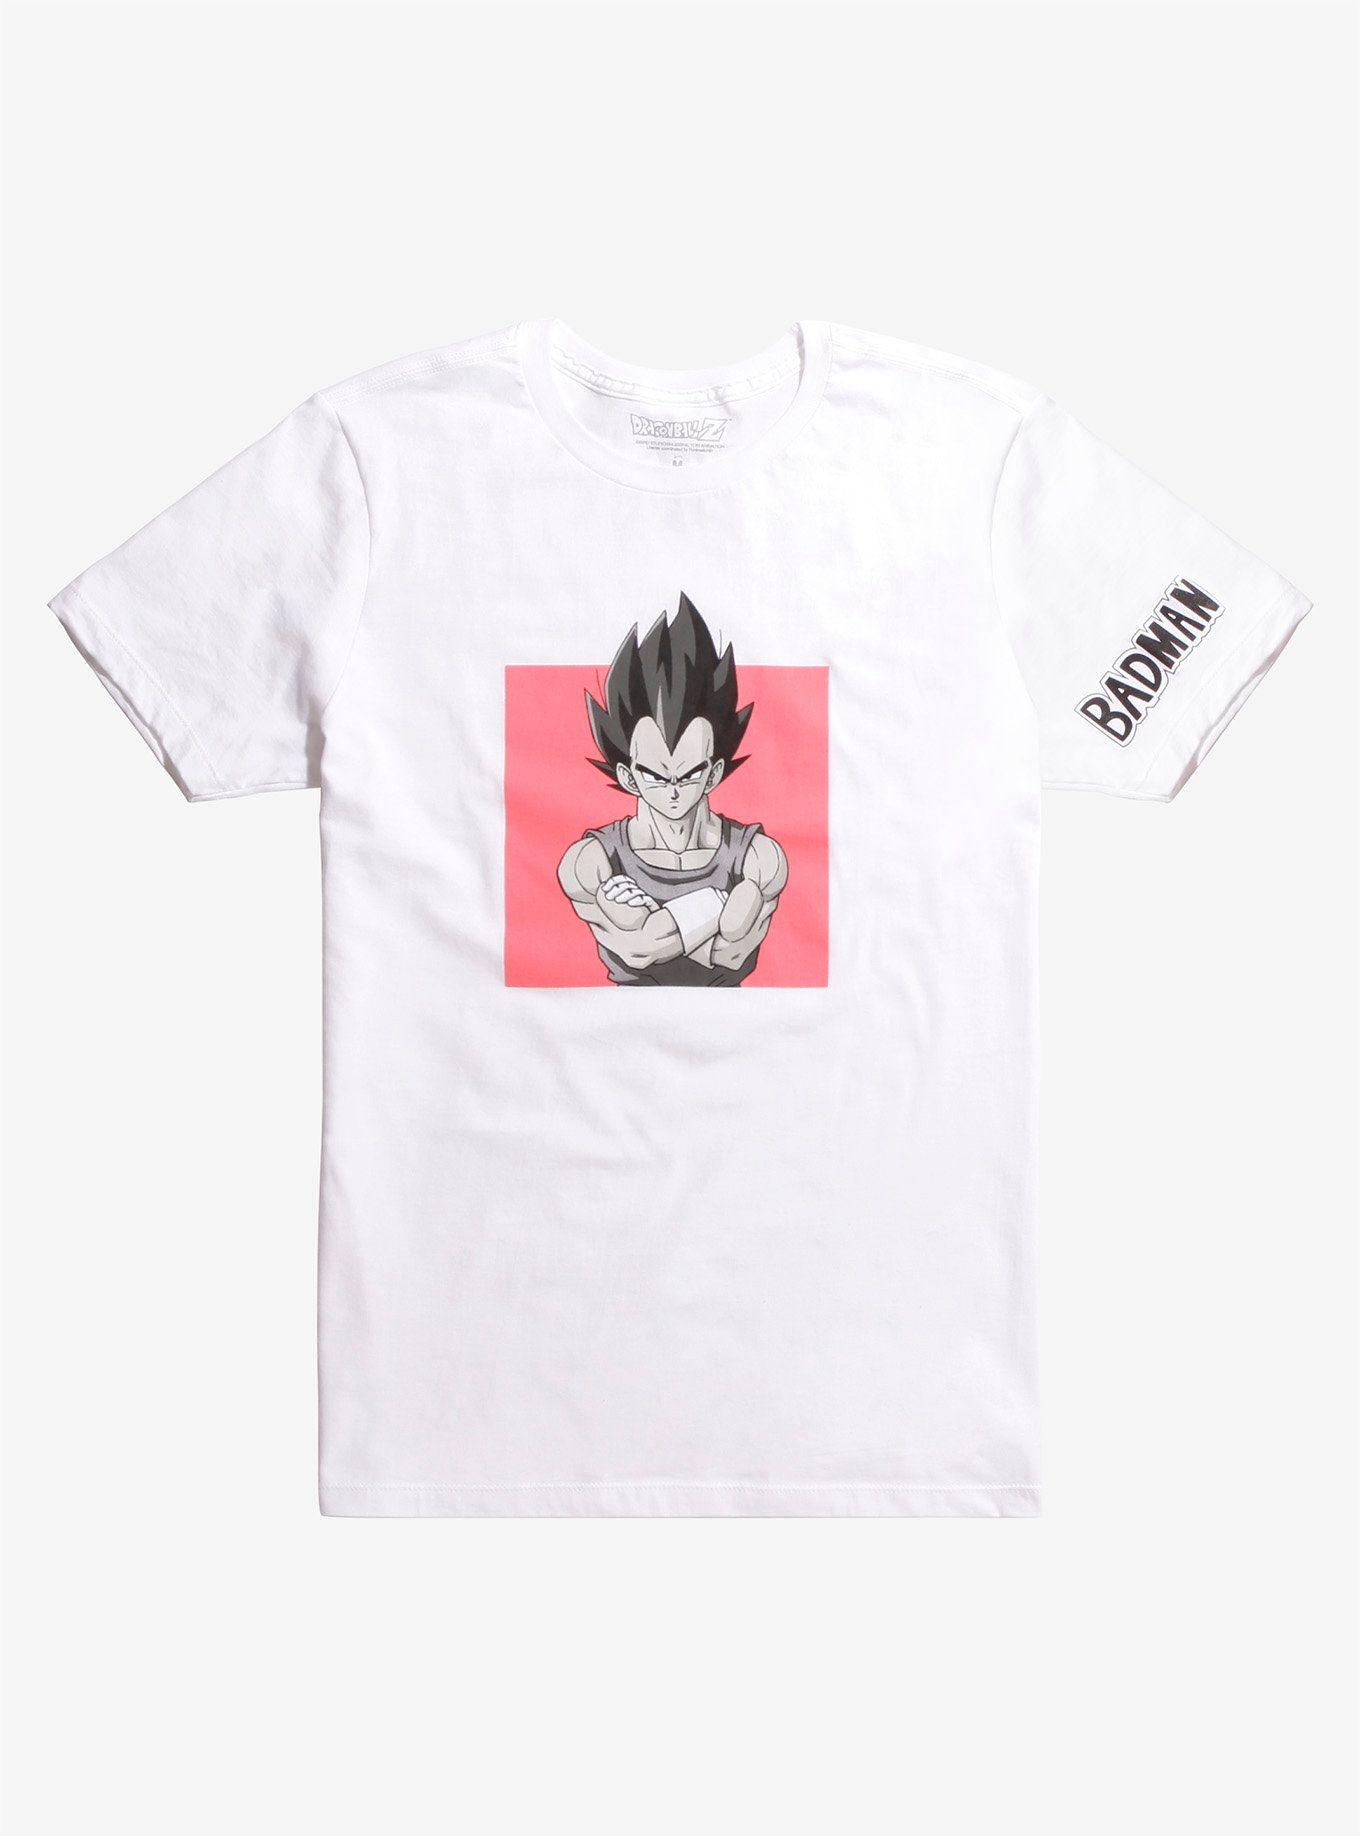 9e1ccca2f Dragon Ball Z Vegeta Badman T-Shirt | FUTURE CLOSET | Dragon ball z ...